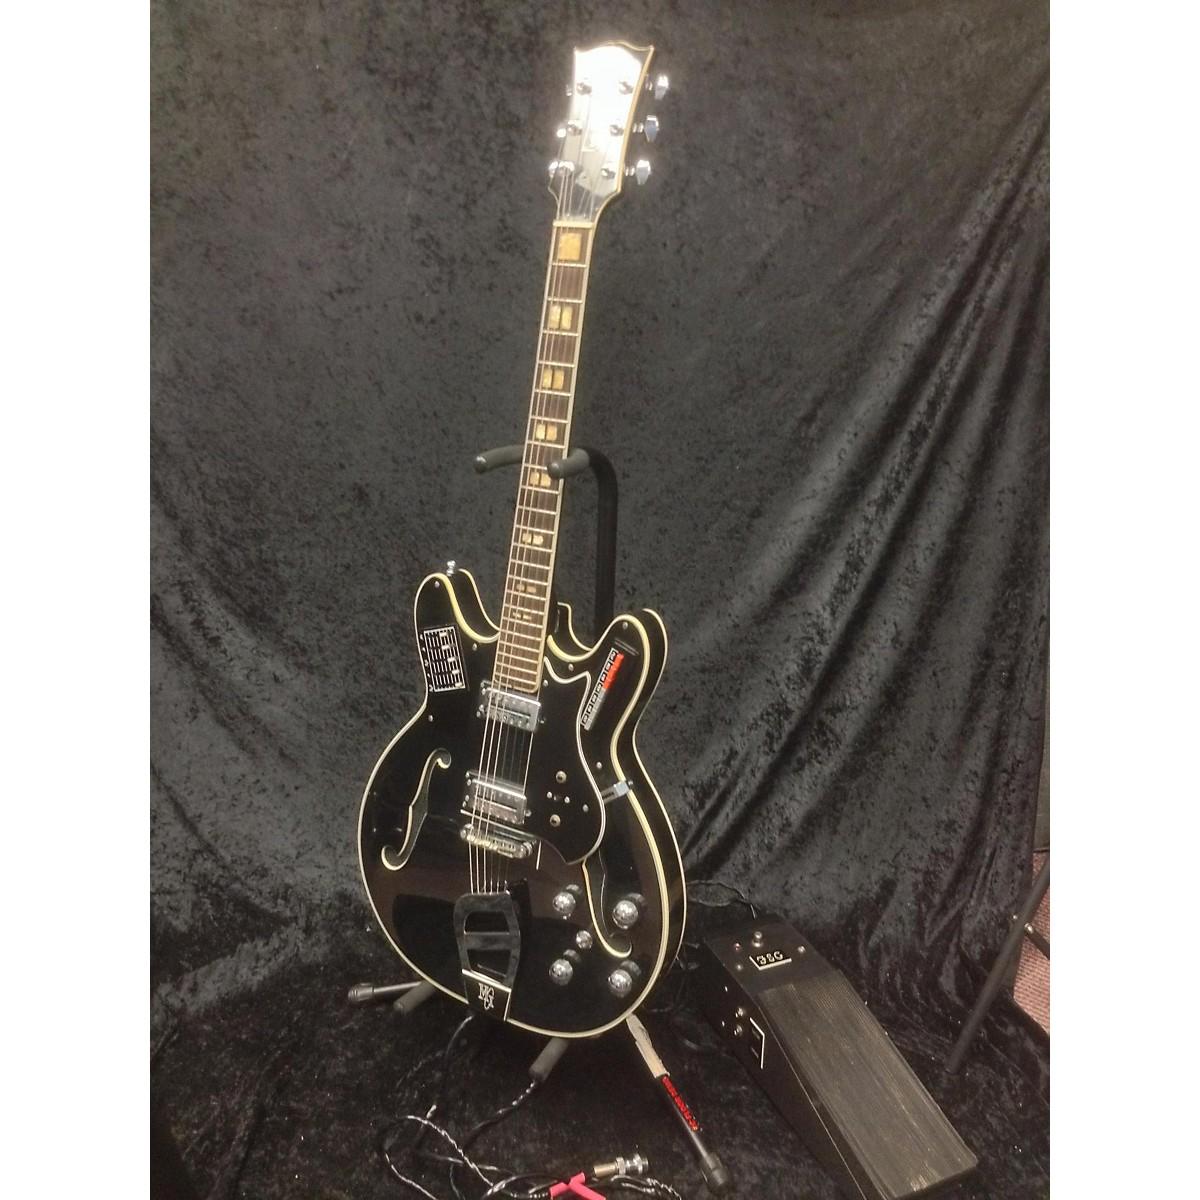 In Store Vintage Vintage 1970s MCI Guitorgan B-300 Black Hollow Body Electric Guitar